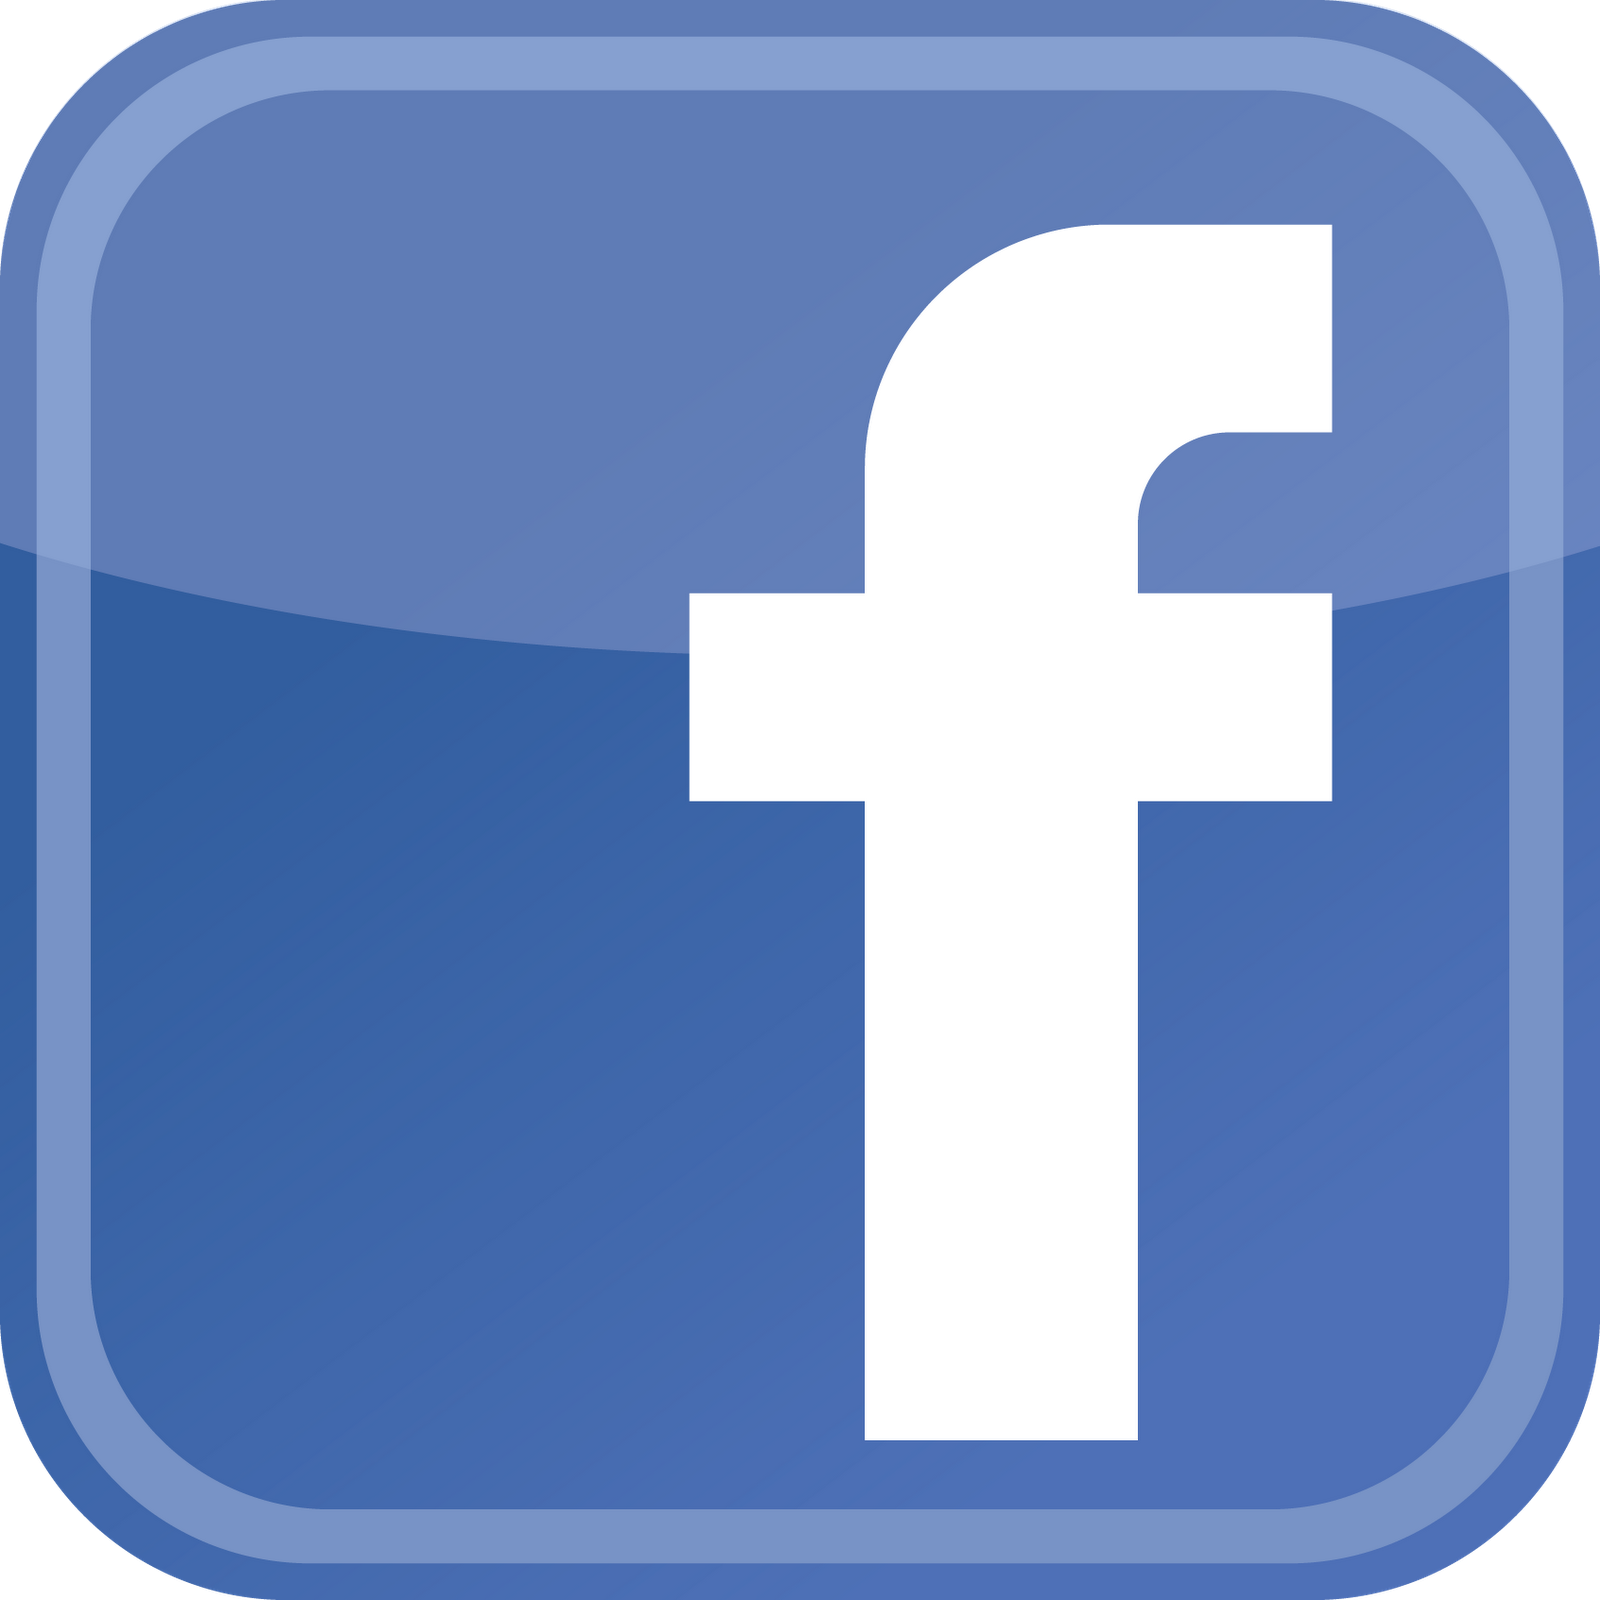 Free symbol transparent background. Facebook clipart ios